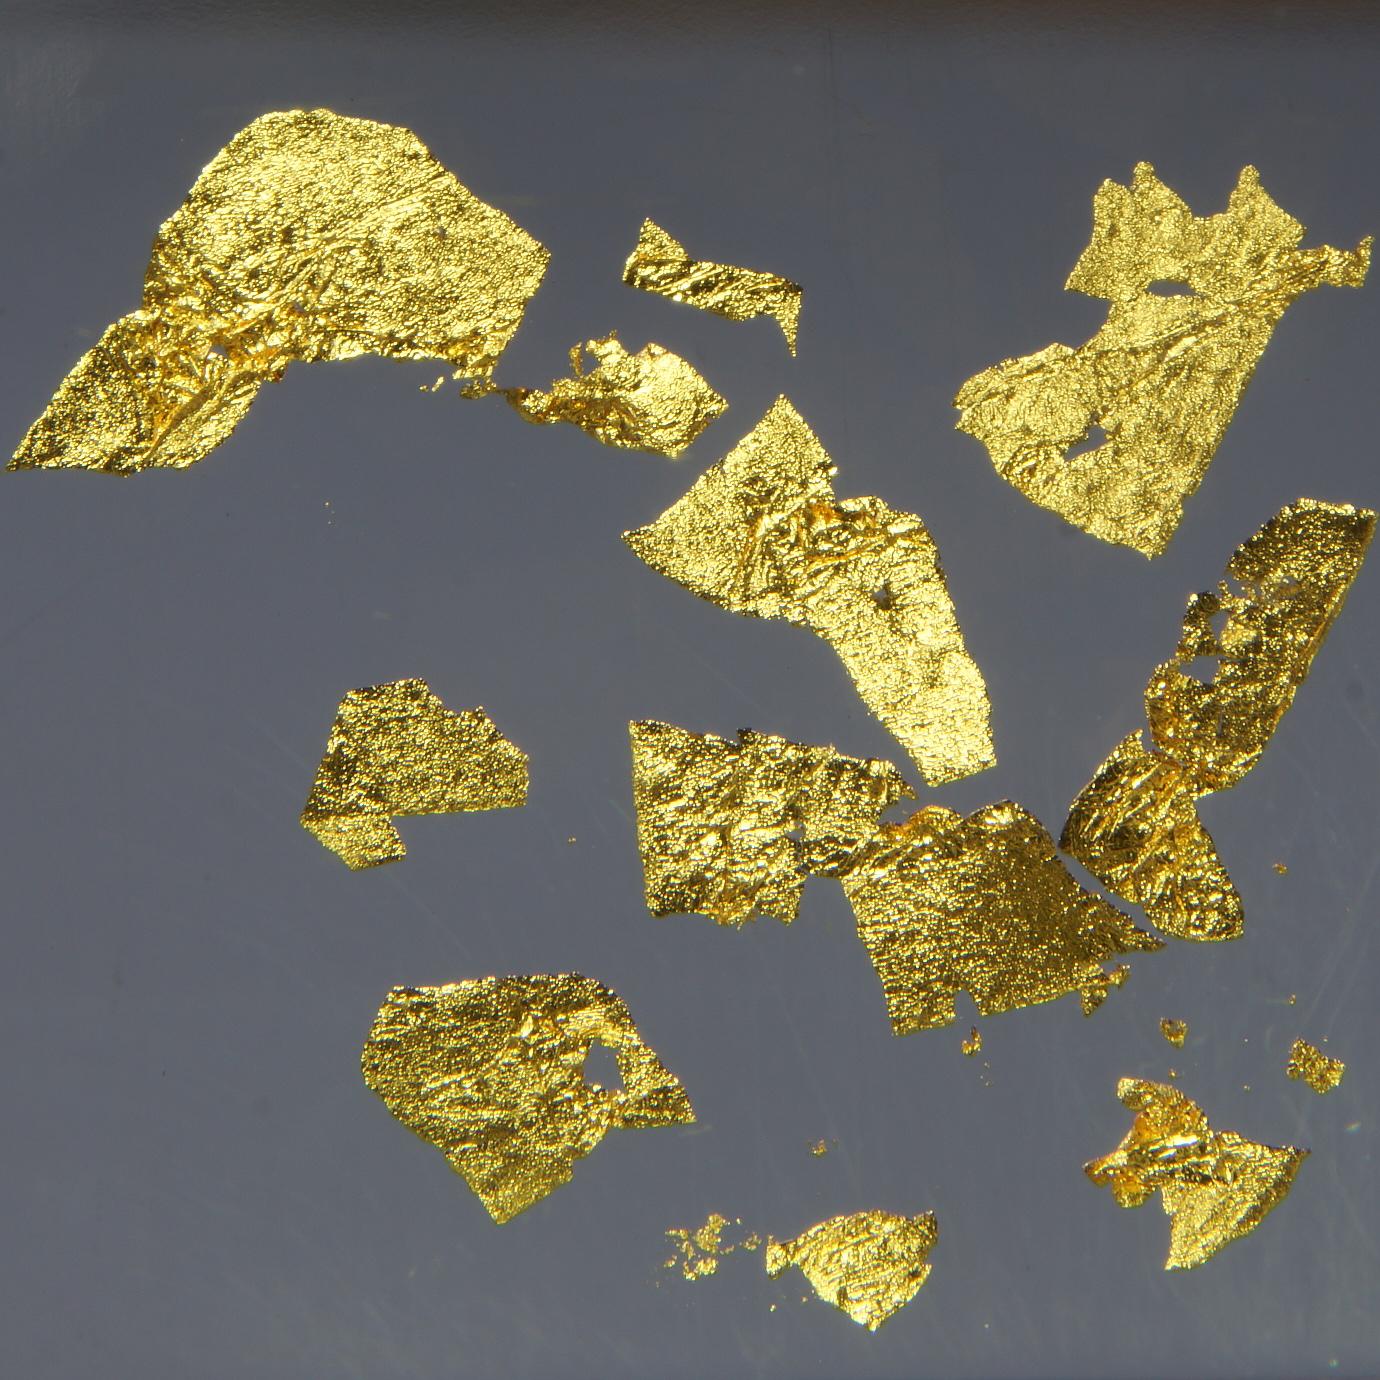 Пластинки из сверхчистого золота. Размеры пластинок - 5..10 мм.